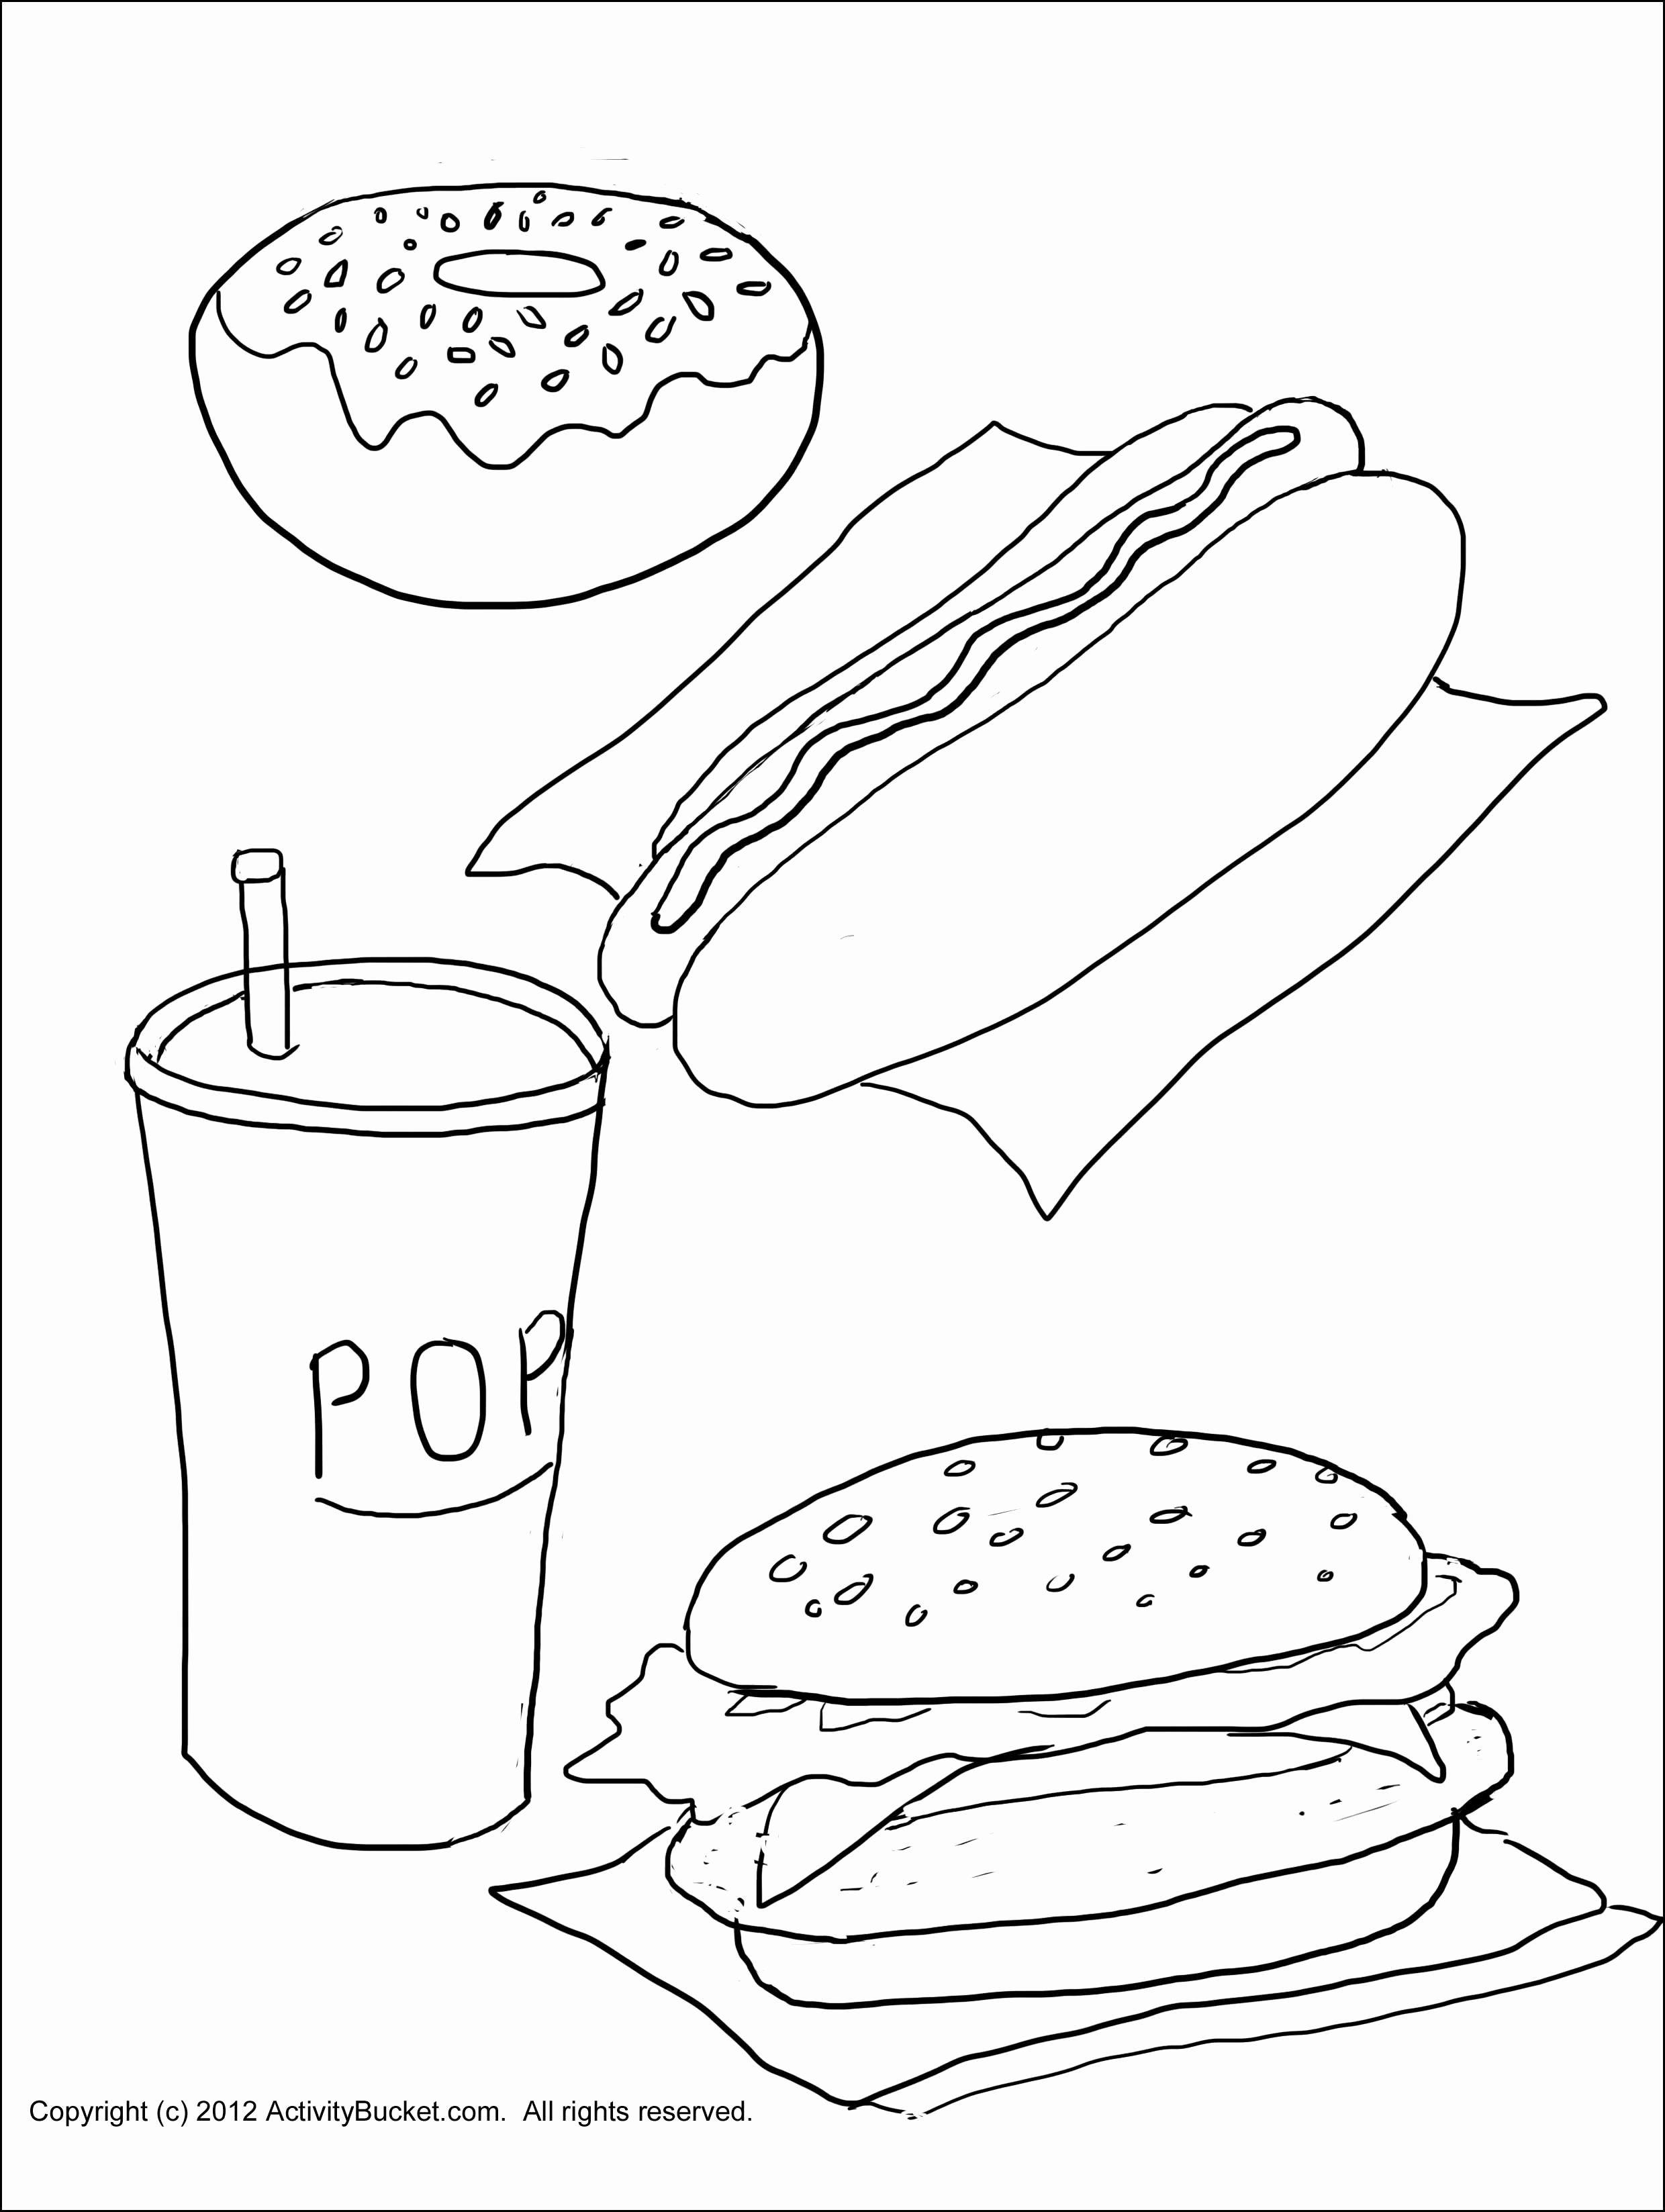 Picnic Food Coloring Pages Food Coloring Pages Coloring Pages Free Coloring Pages